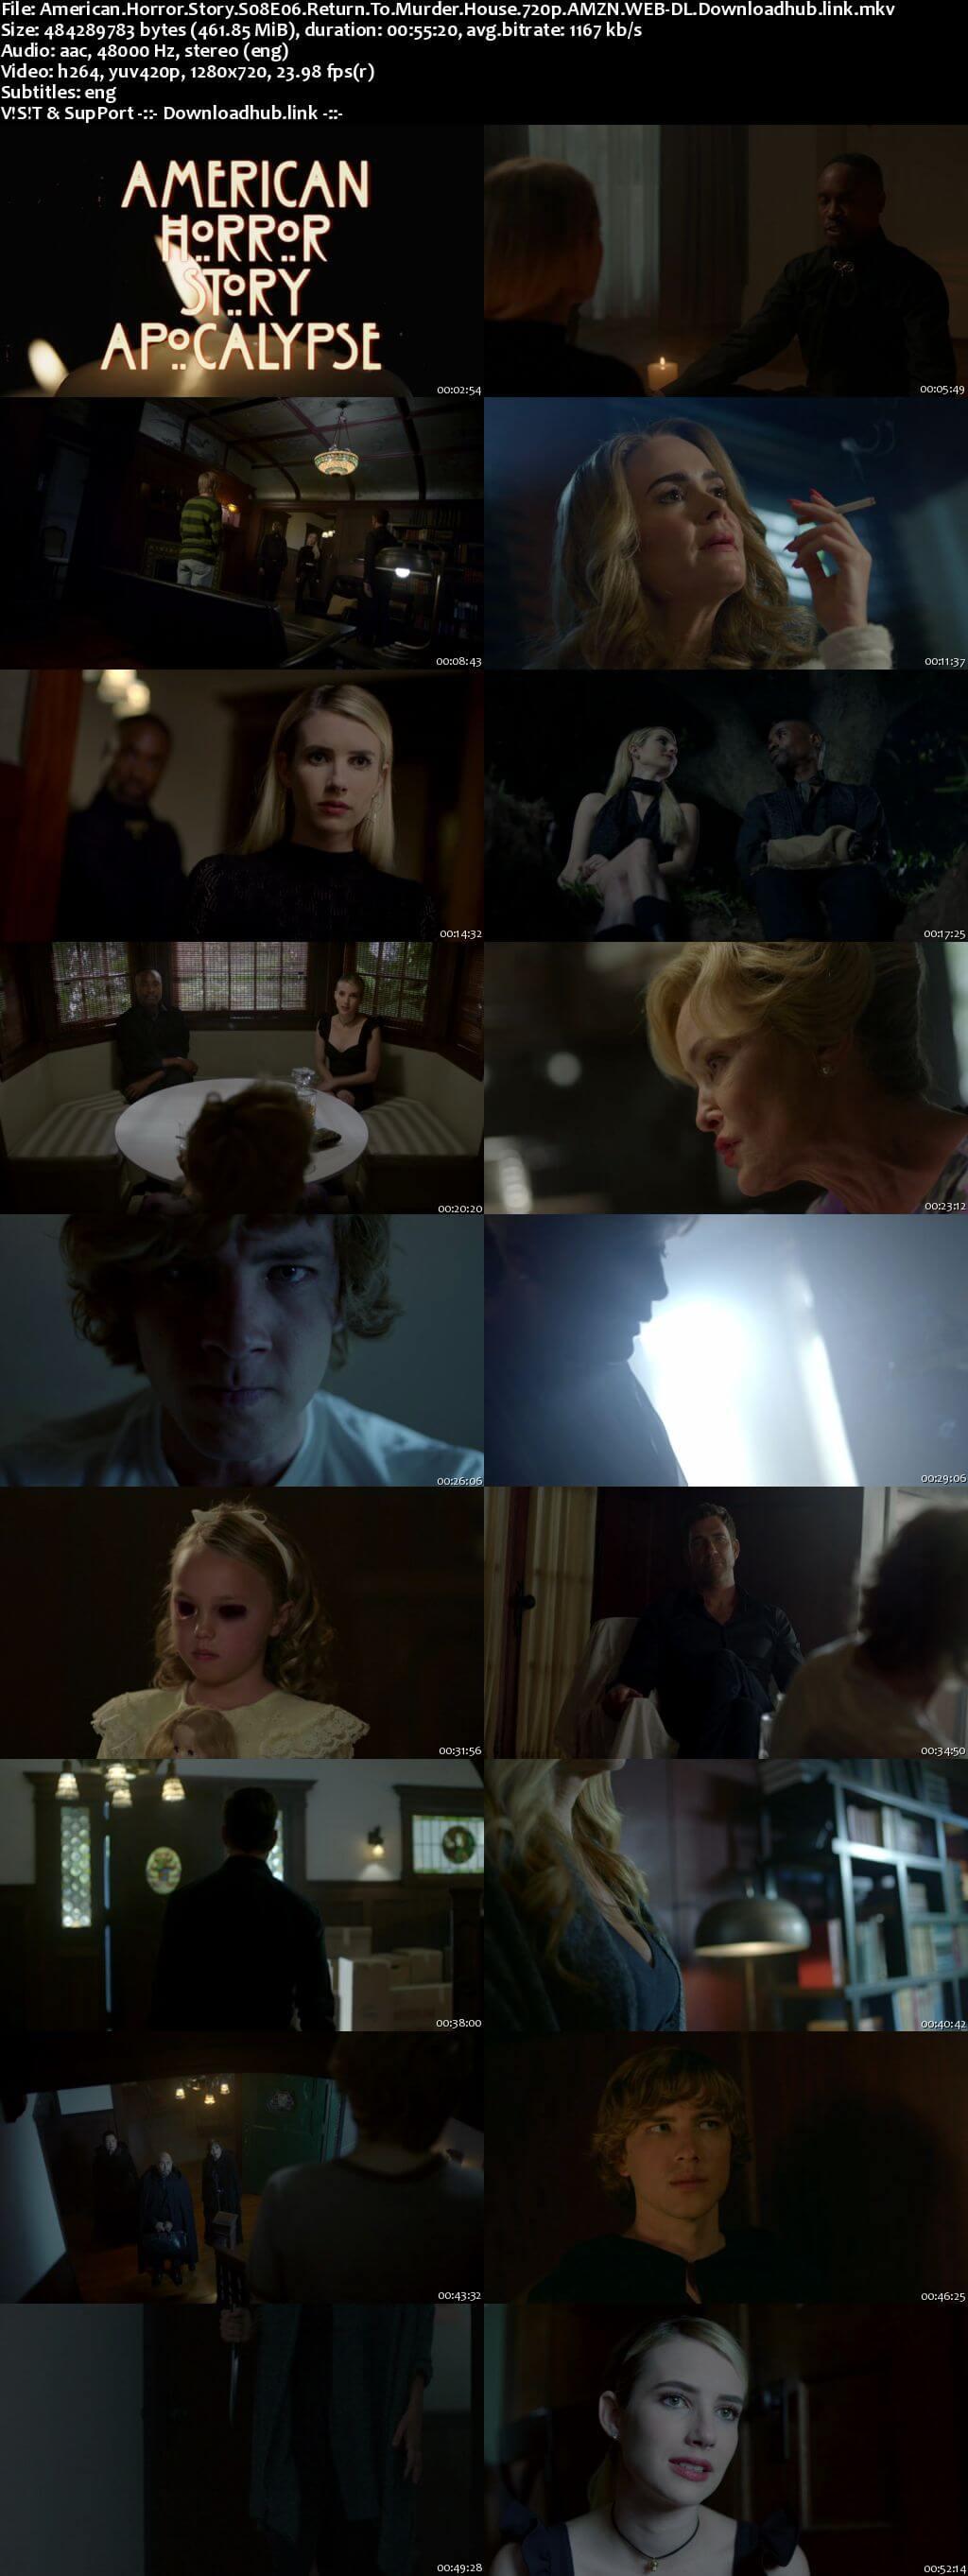 American Horror Story S08E06 350MB AMZN WEB-DL 720p ESubs